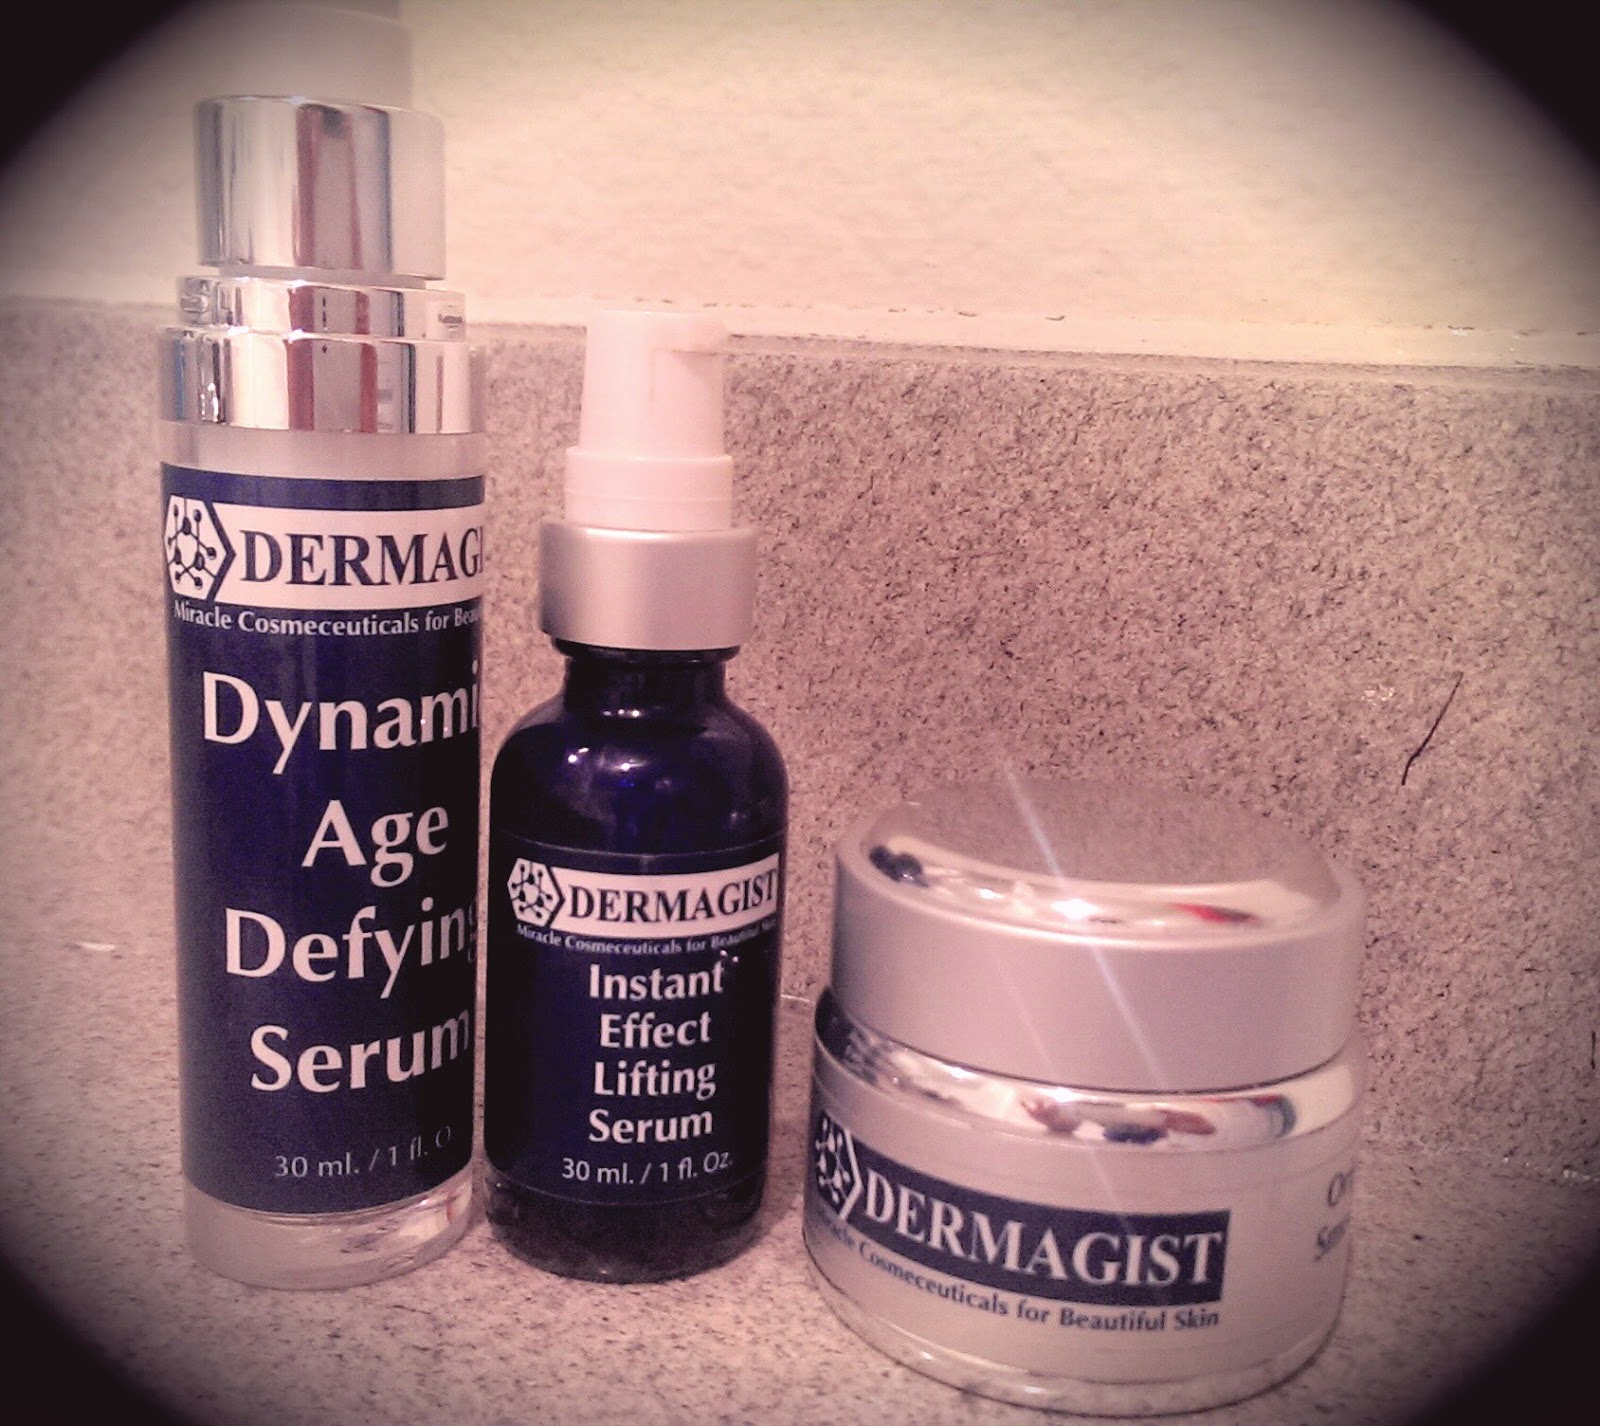 Dermagist+Skin+Care Dermagist Complete Rejuvenation System Review - Anti Aging Review